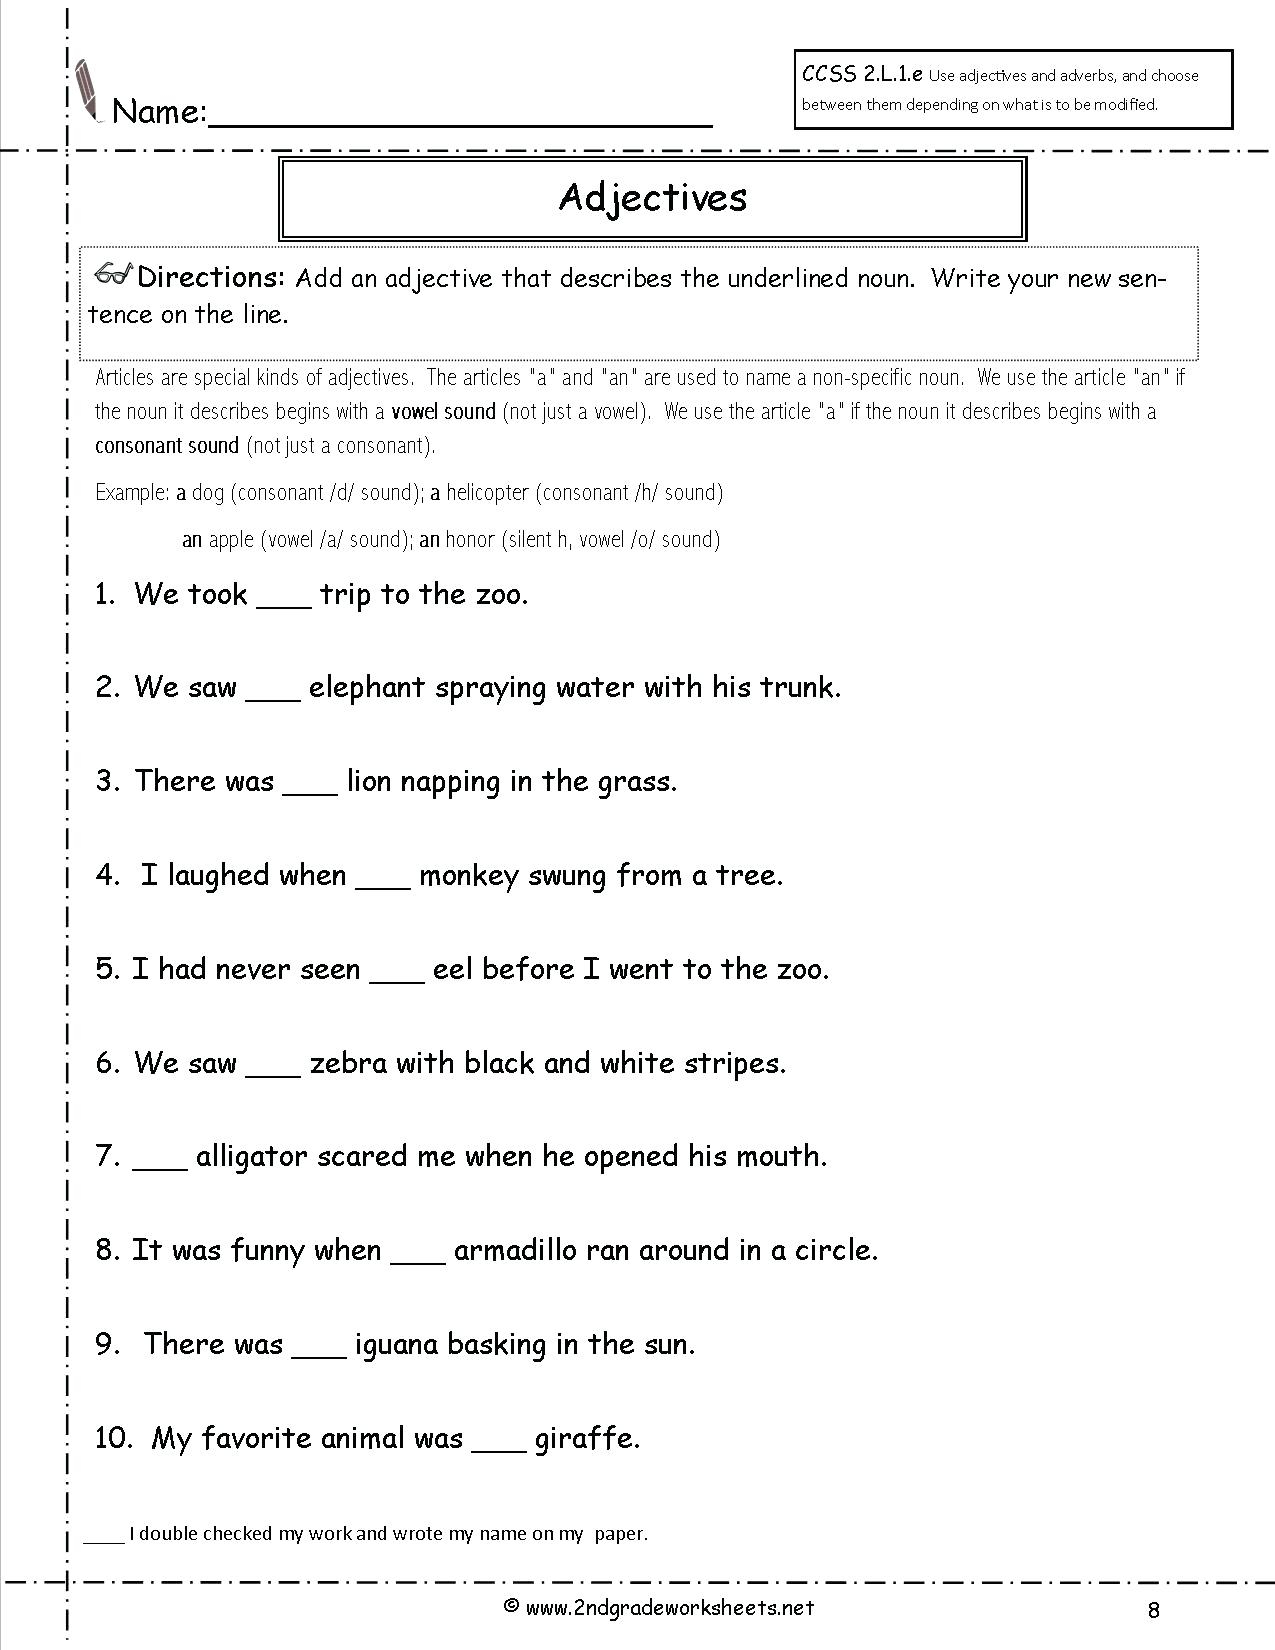 5th Grade Science Worksheets Printable Free